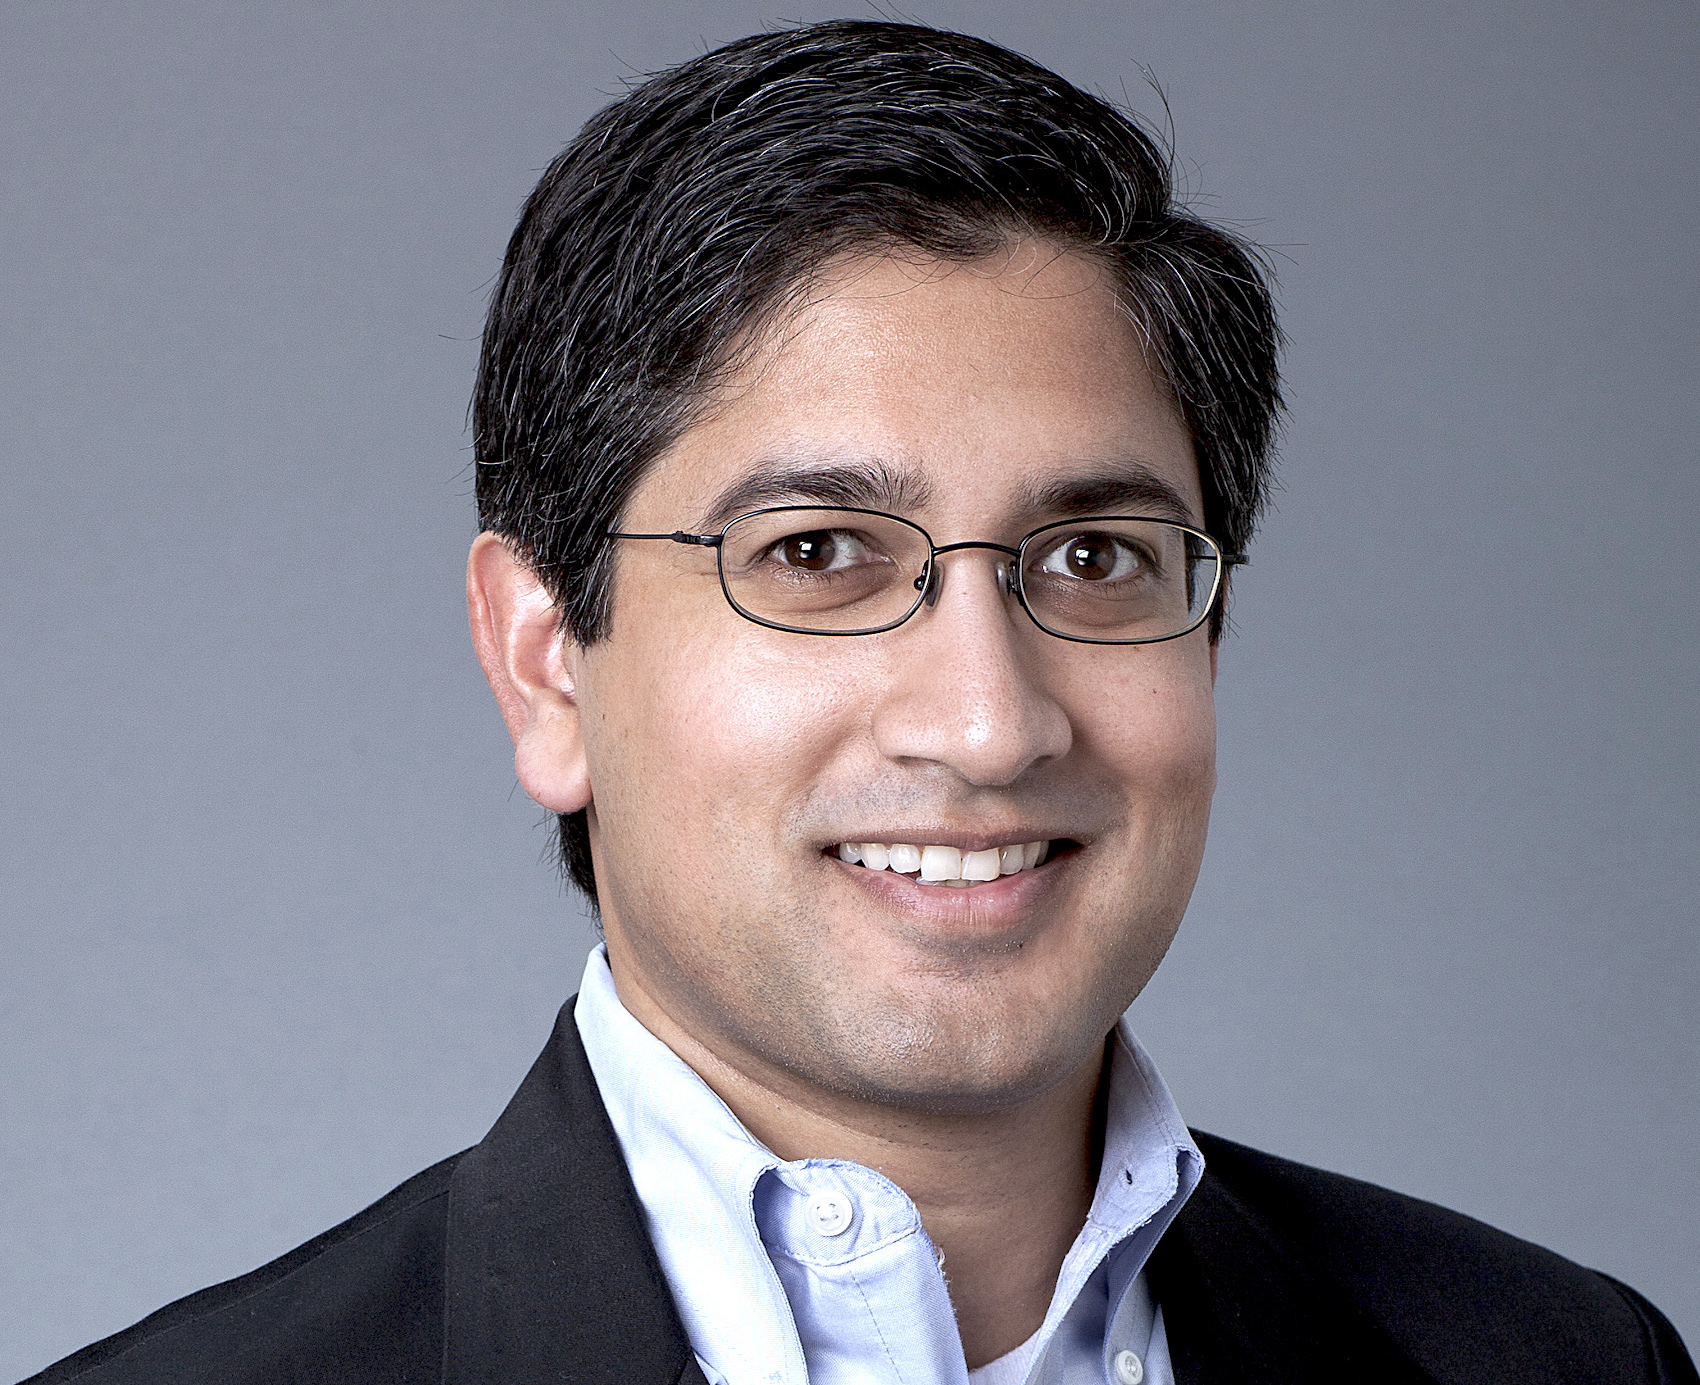 Shuman Ghosemajumder, F5